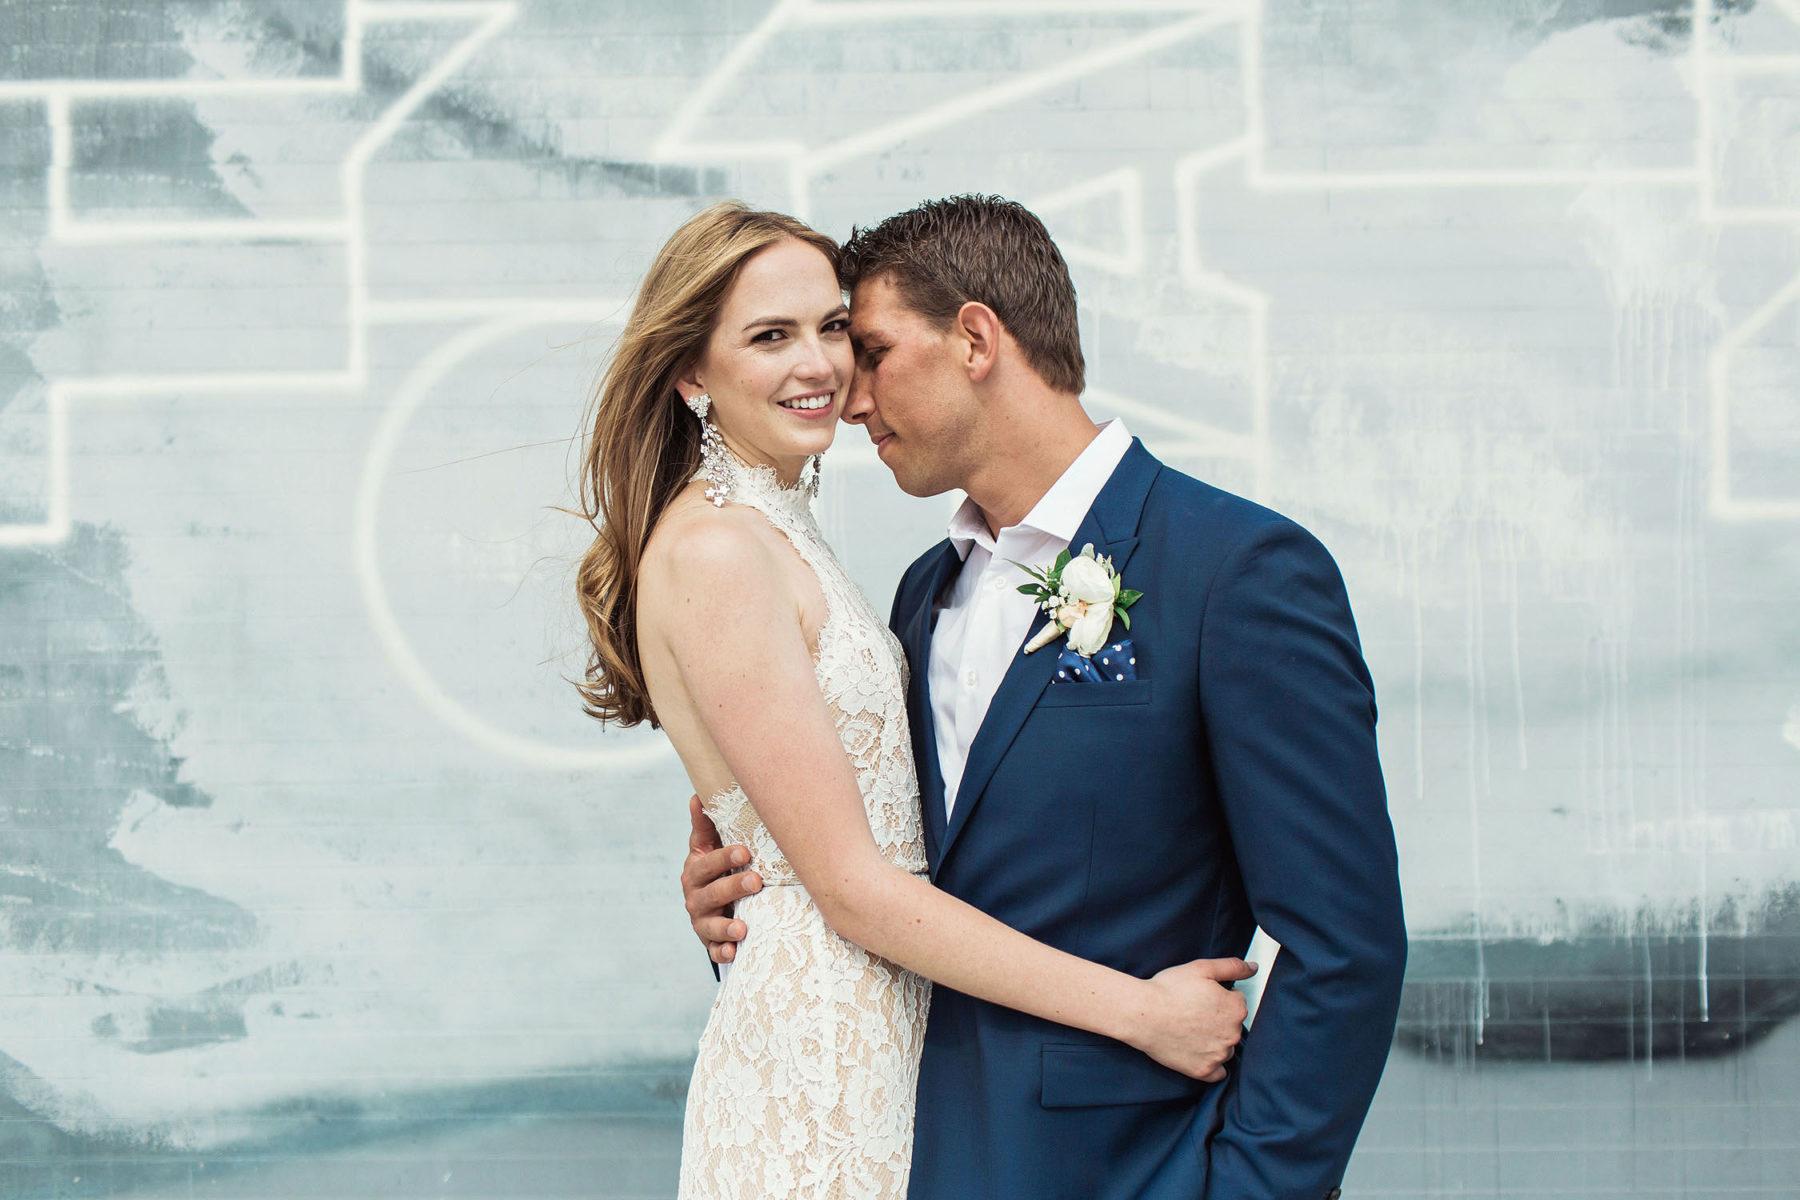 Bushwick Wedding Portraits - Awesome Brooklyn Wedding Photographer